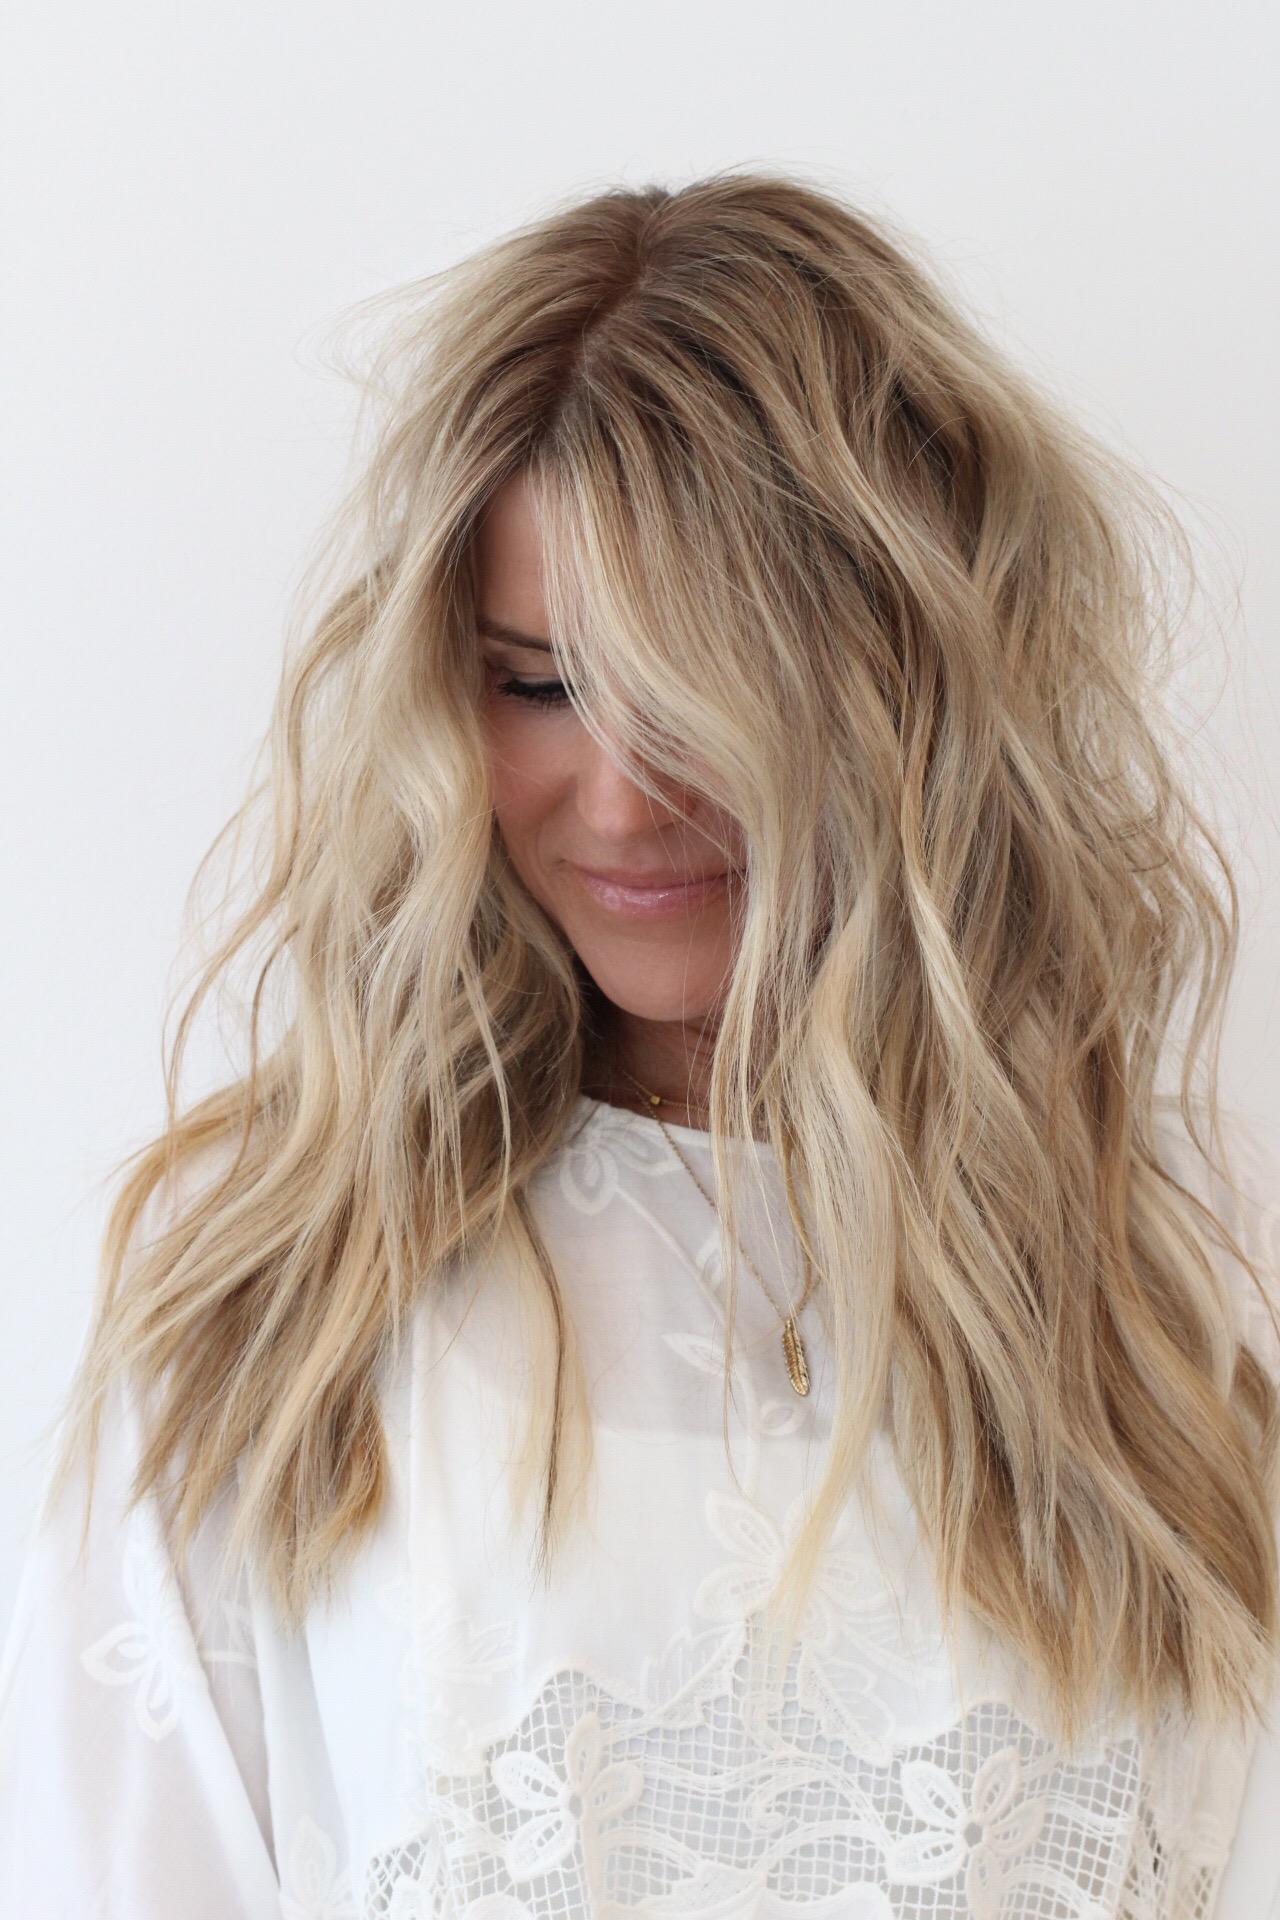 #BMSCon - NBR Hair Extensions